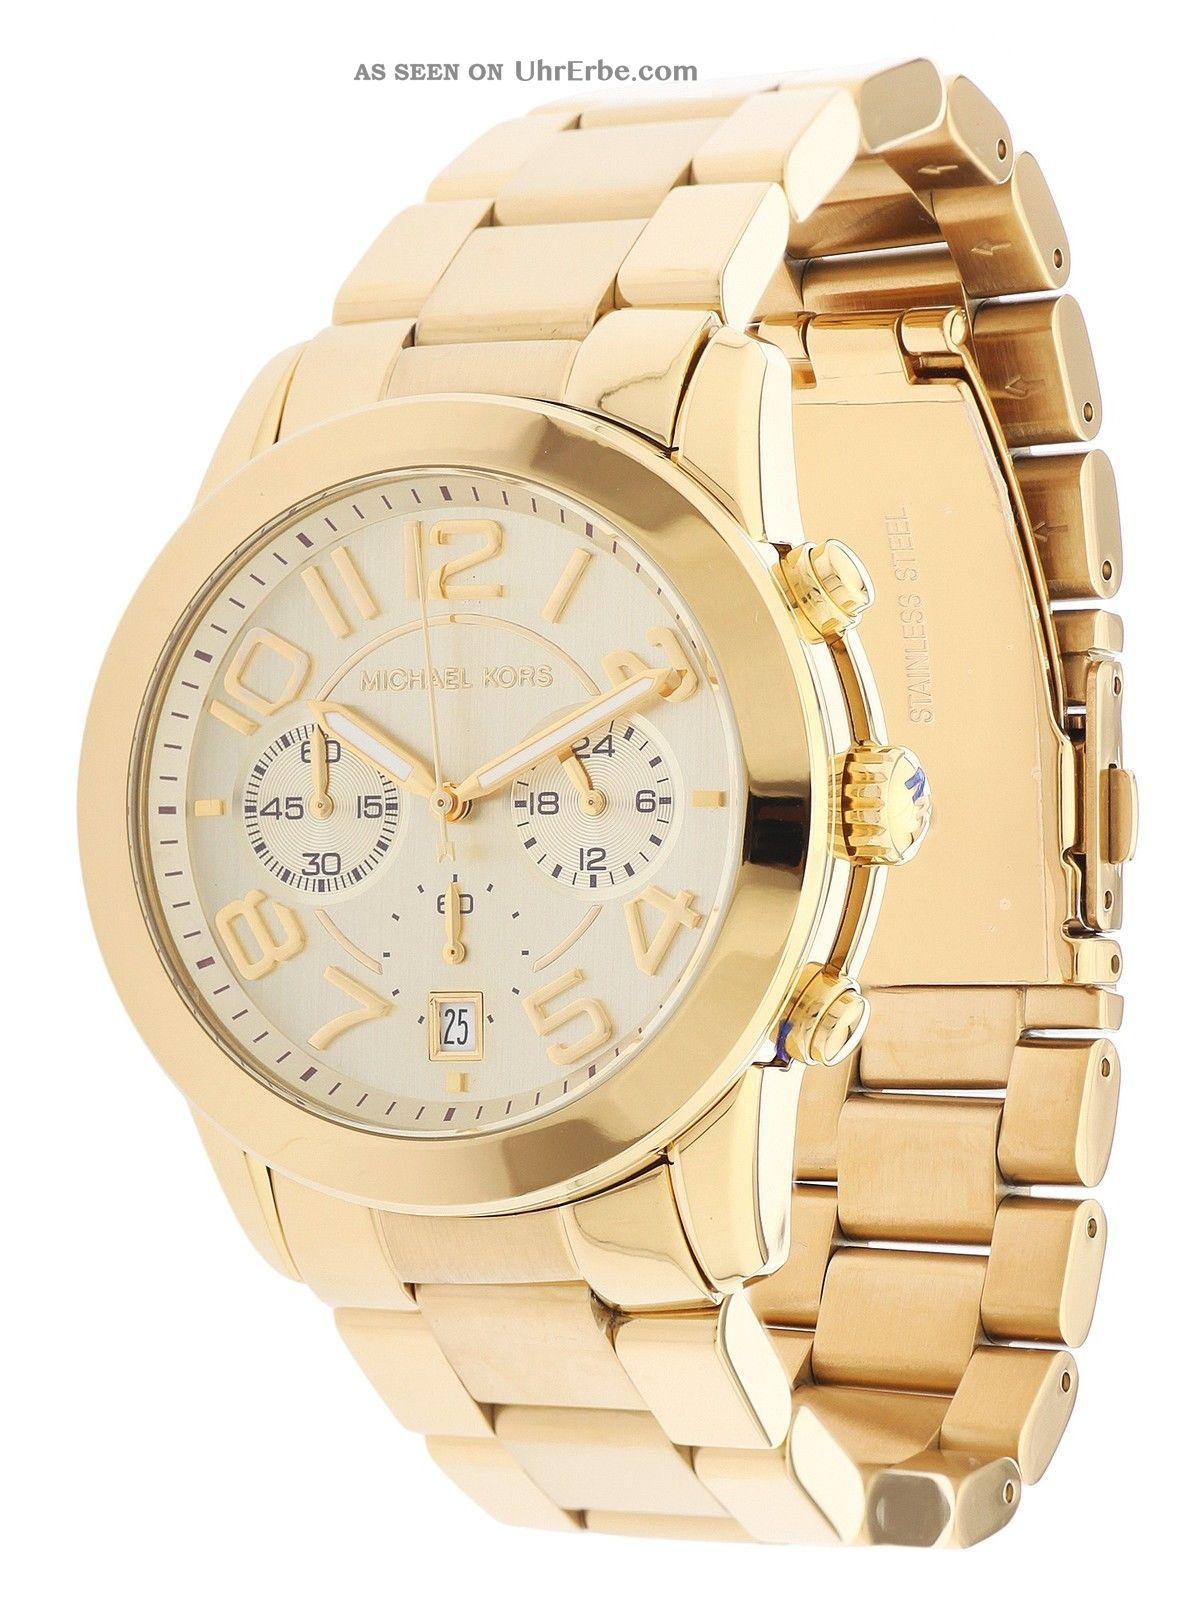 Michael Kors Damen Armbanduhr Gold Mk5726 Armbanduhren Bild